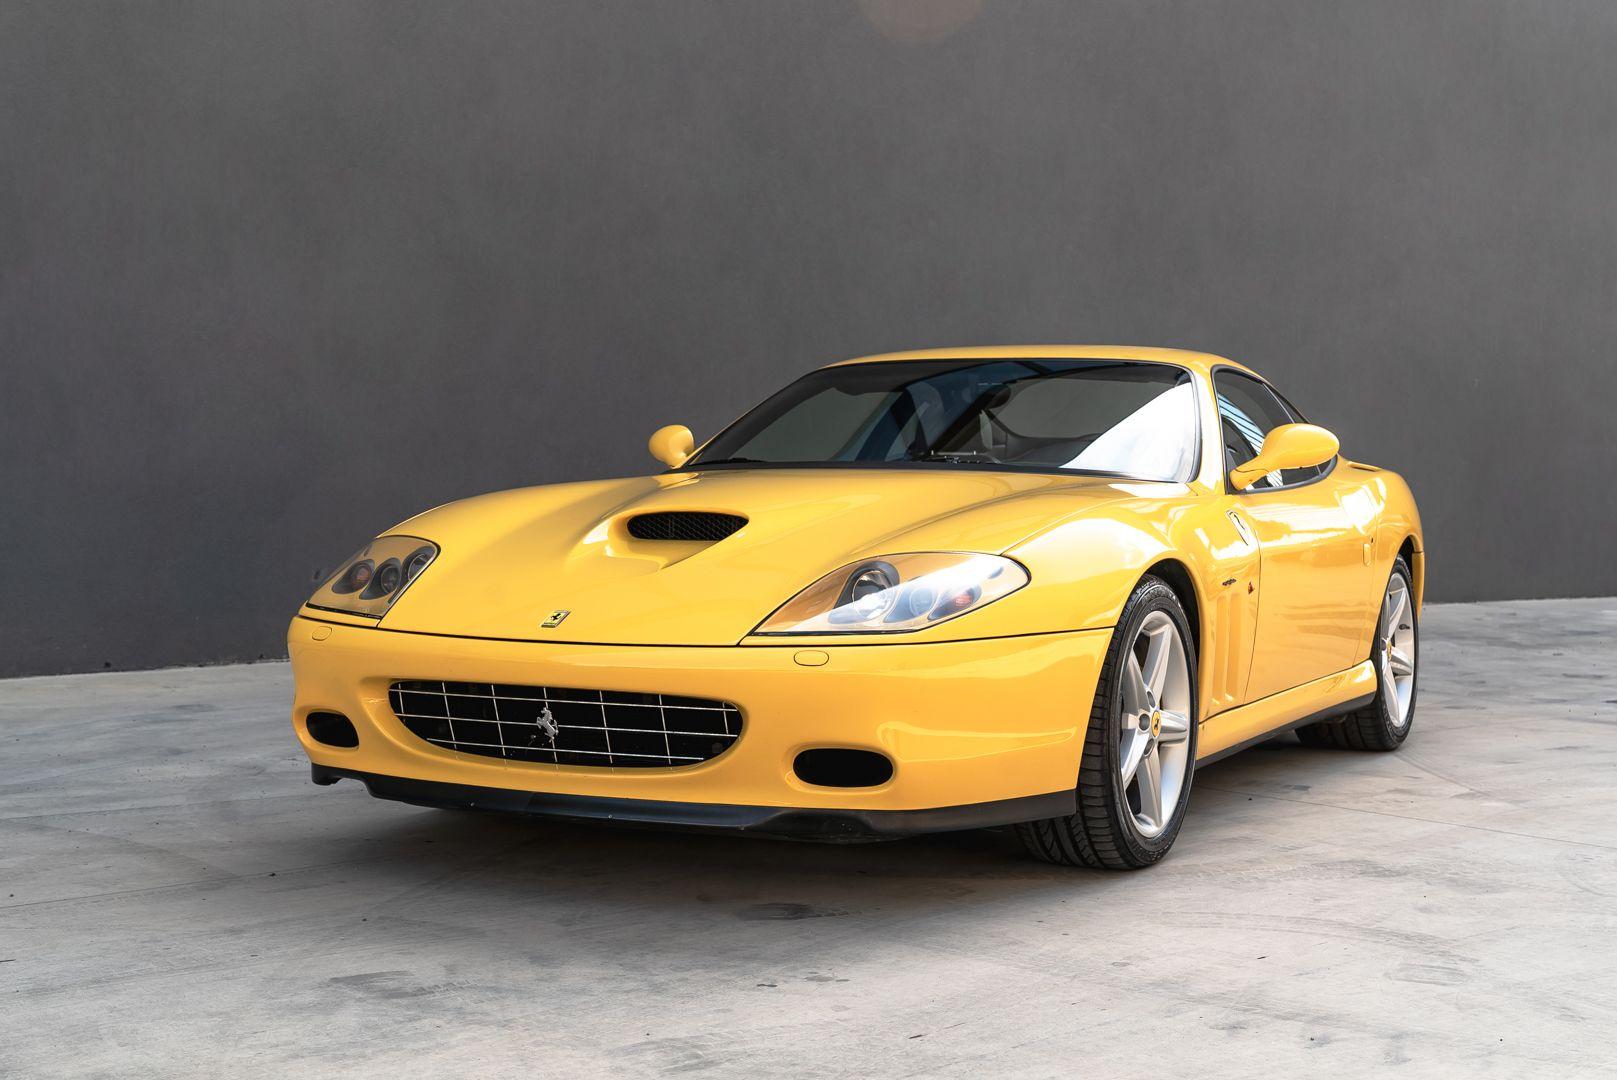 2002 Ferrari 575 Maranello F1 63762